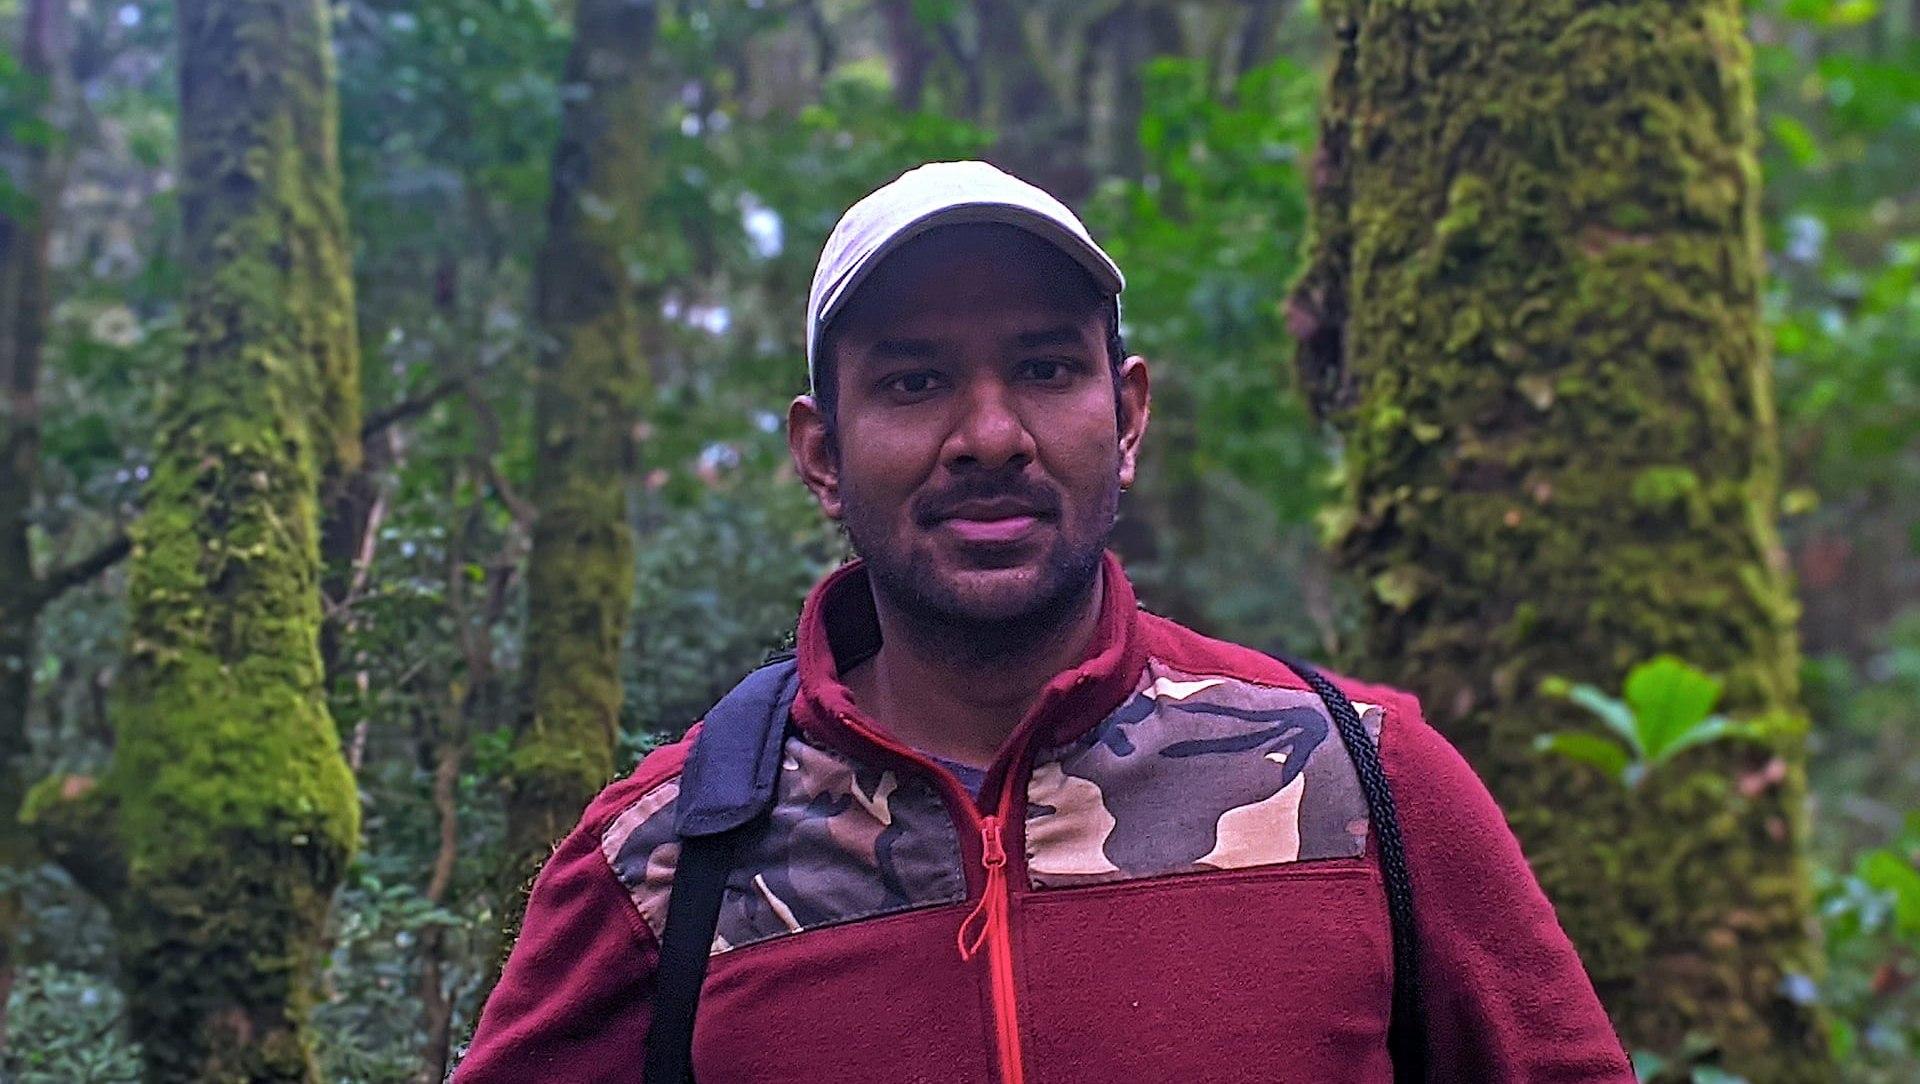 Vasanth Bosco: Choosing the Promise of the Present